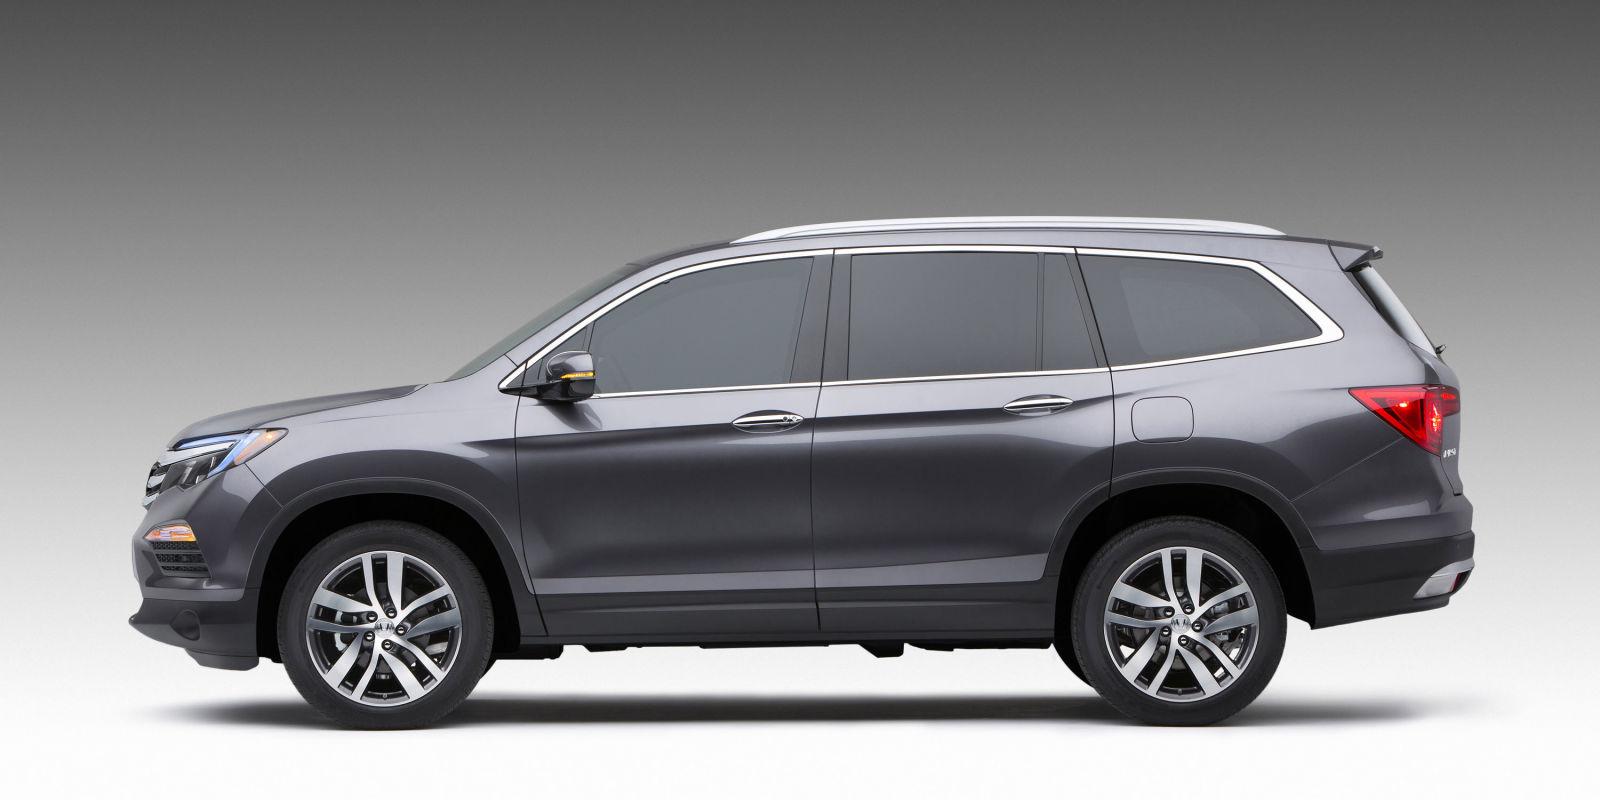 driver honda models rating applies test small door side vehicle image ratings v iihs pilot overlap to suv api